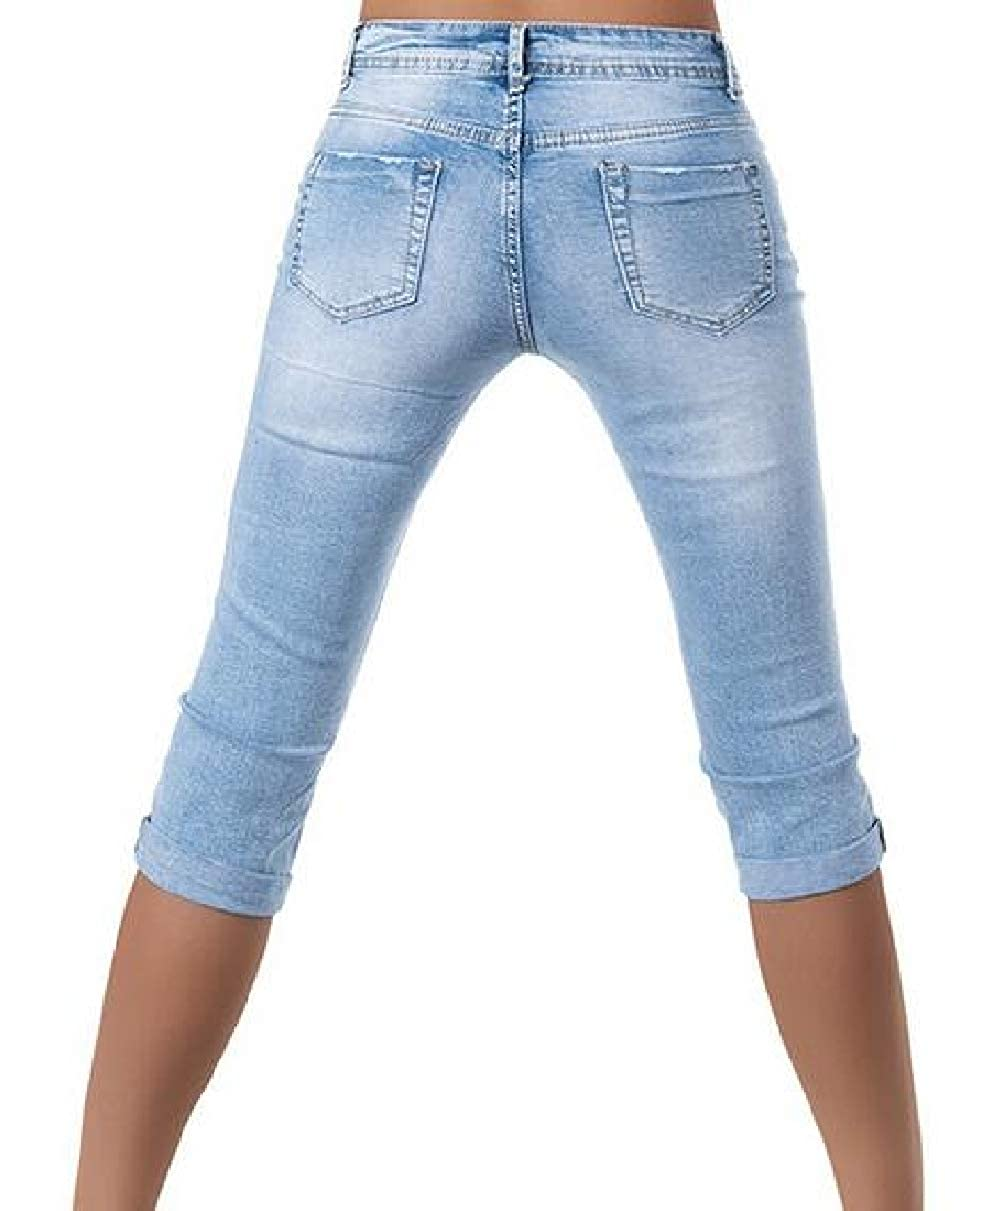 YIhujiuben Womens Fashion Shorts Mid Rise Stretchy Denim Destroyed Capri Jeans